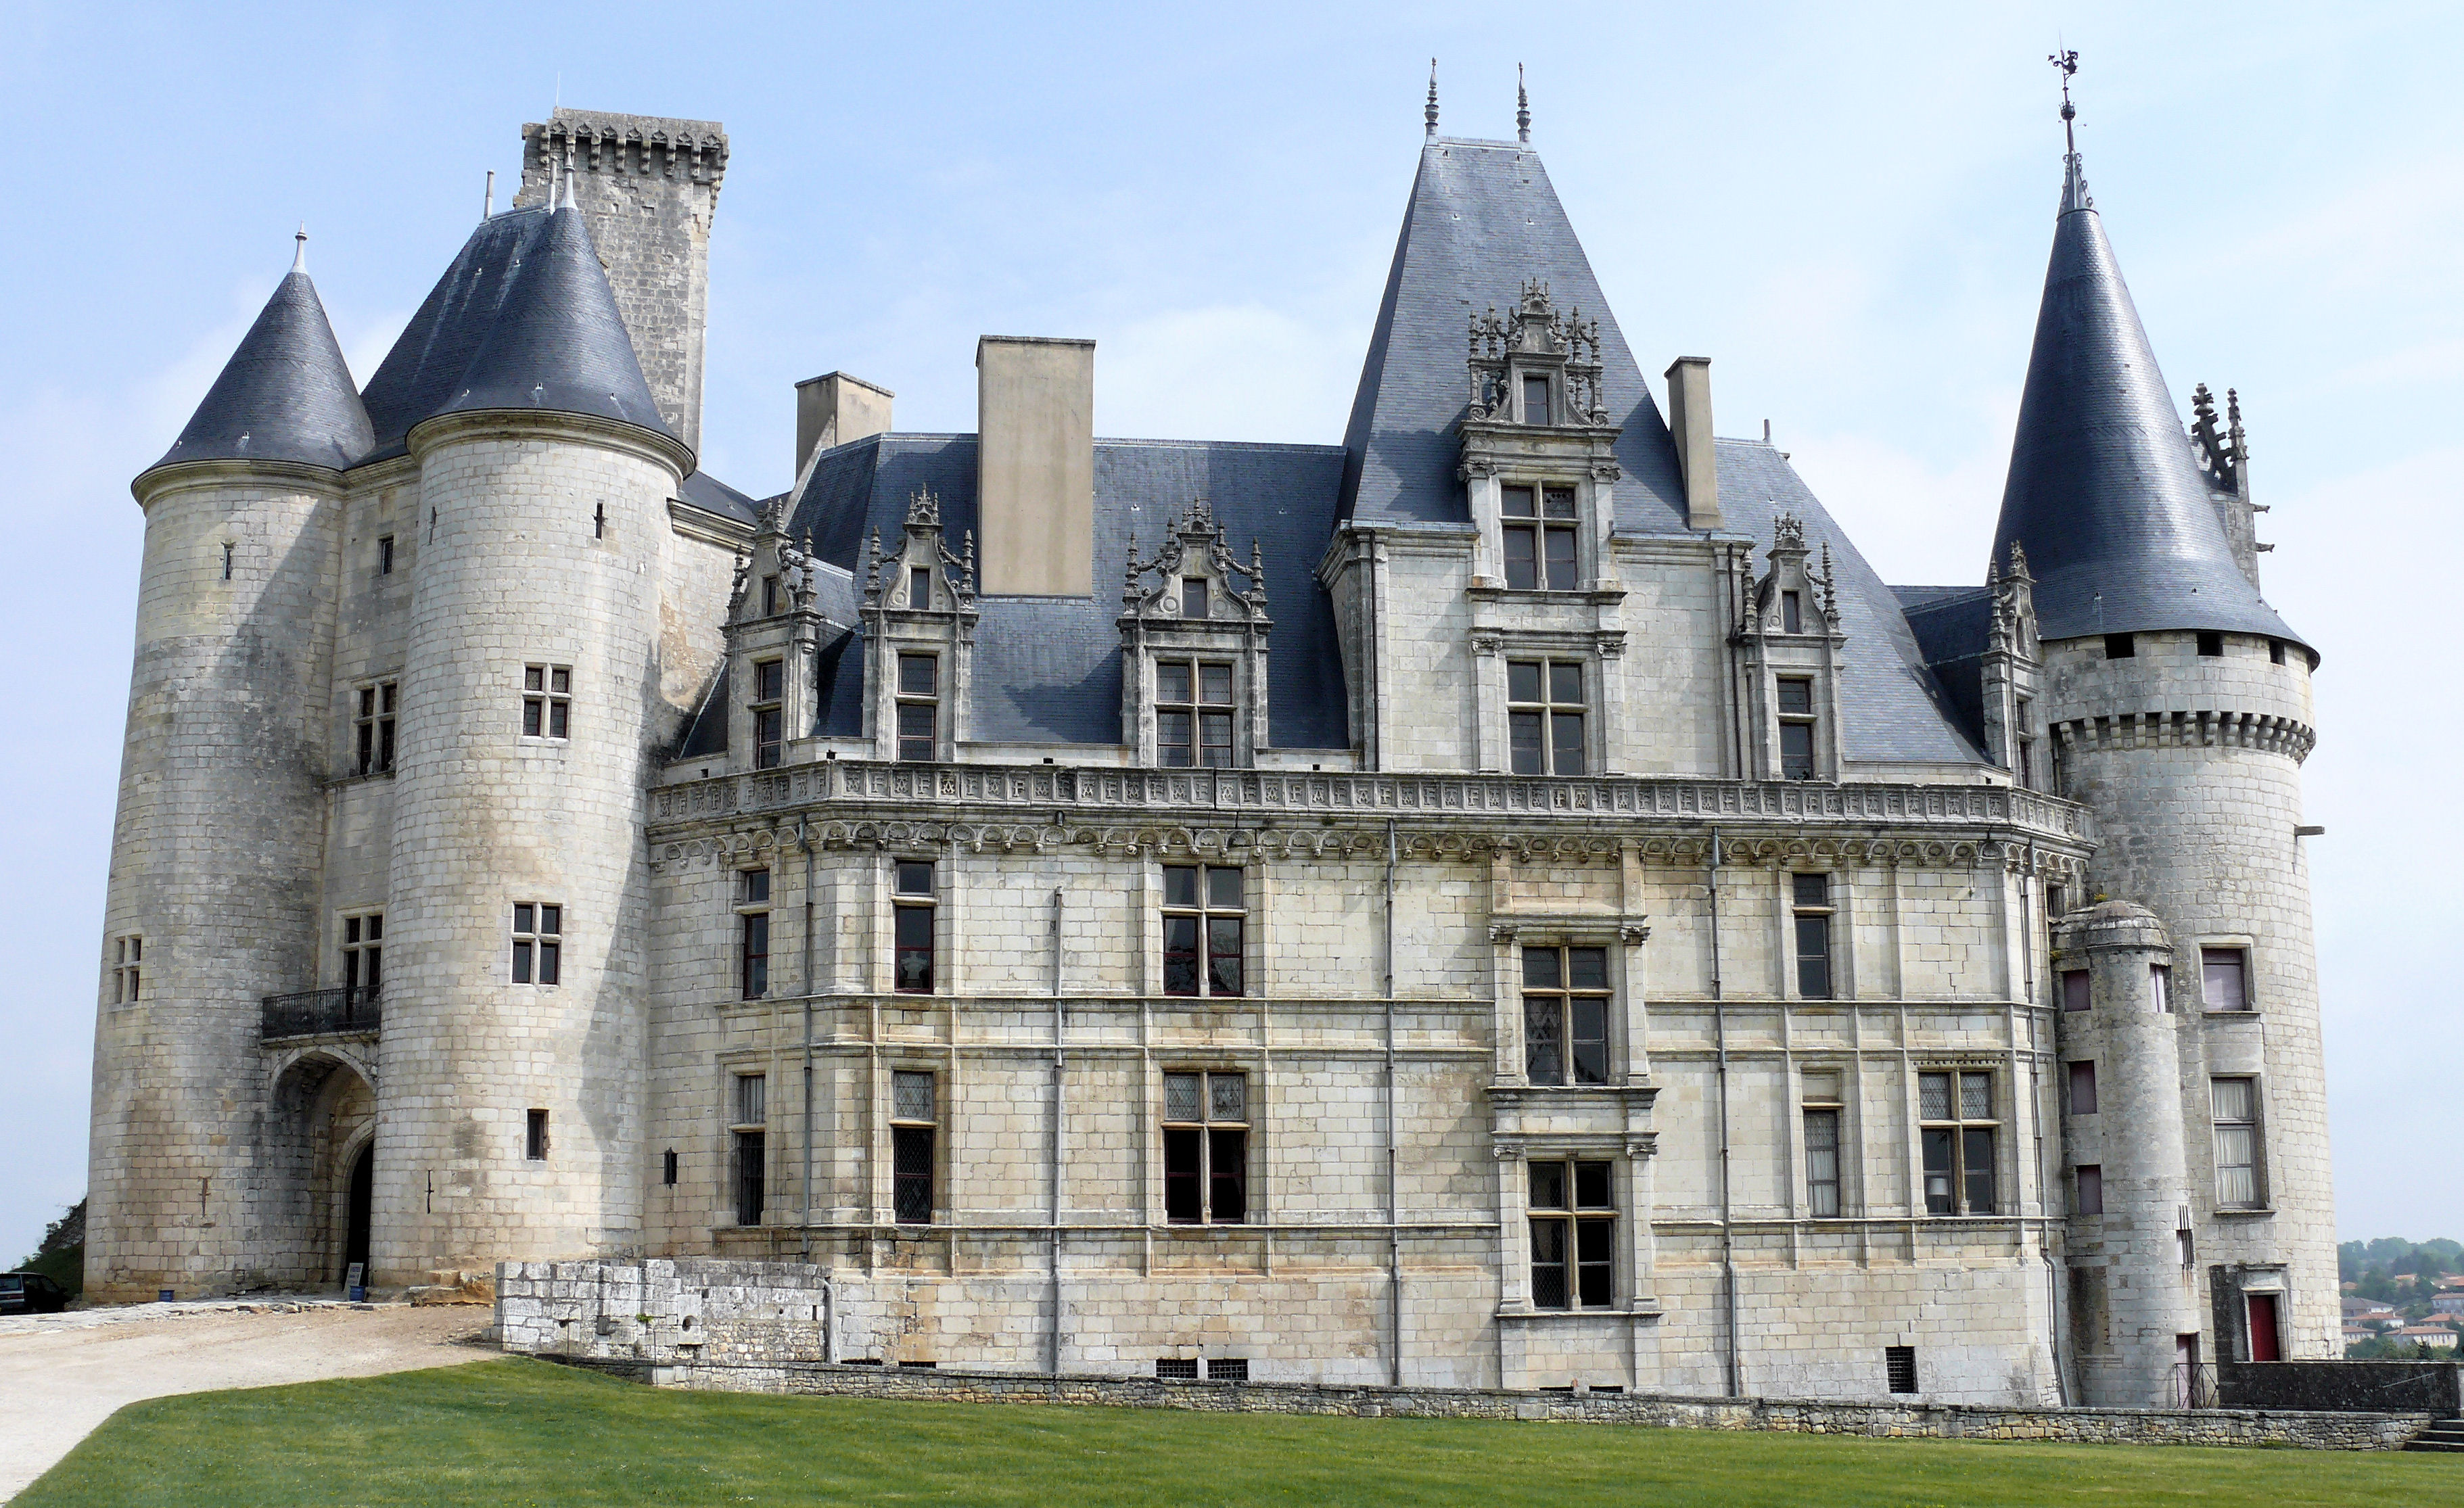 Château_de_La_Rochefoucauld_-_Aile_Sud_-1